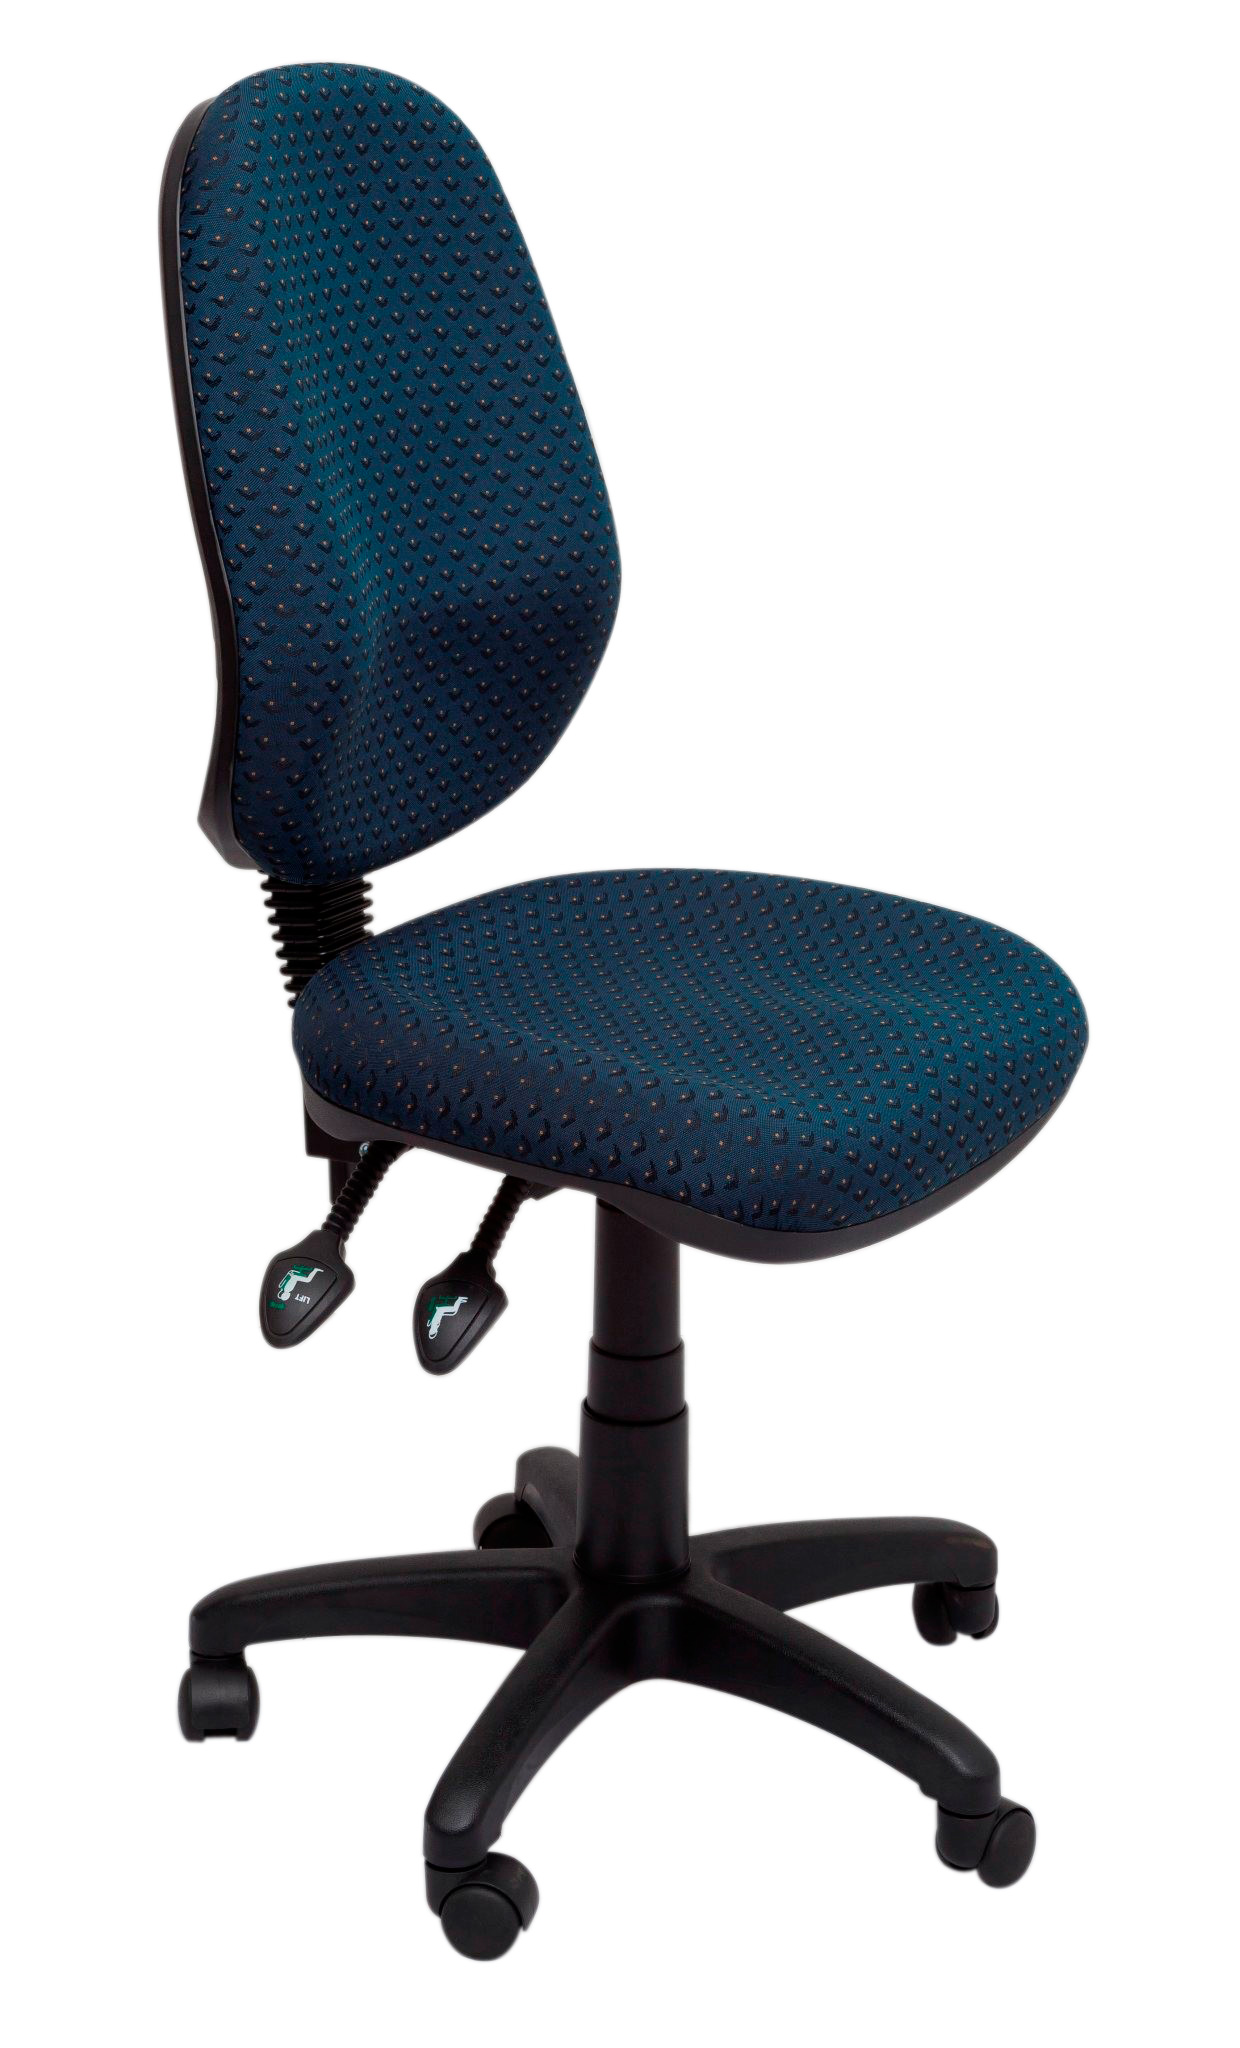 EC070BH Operator Chair High back Gas lift Fabric Night Flight